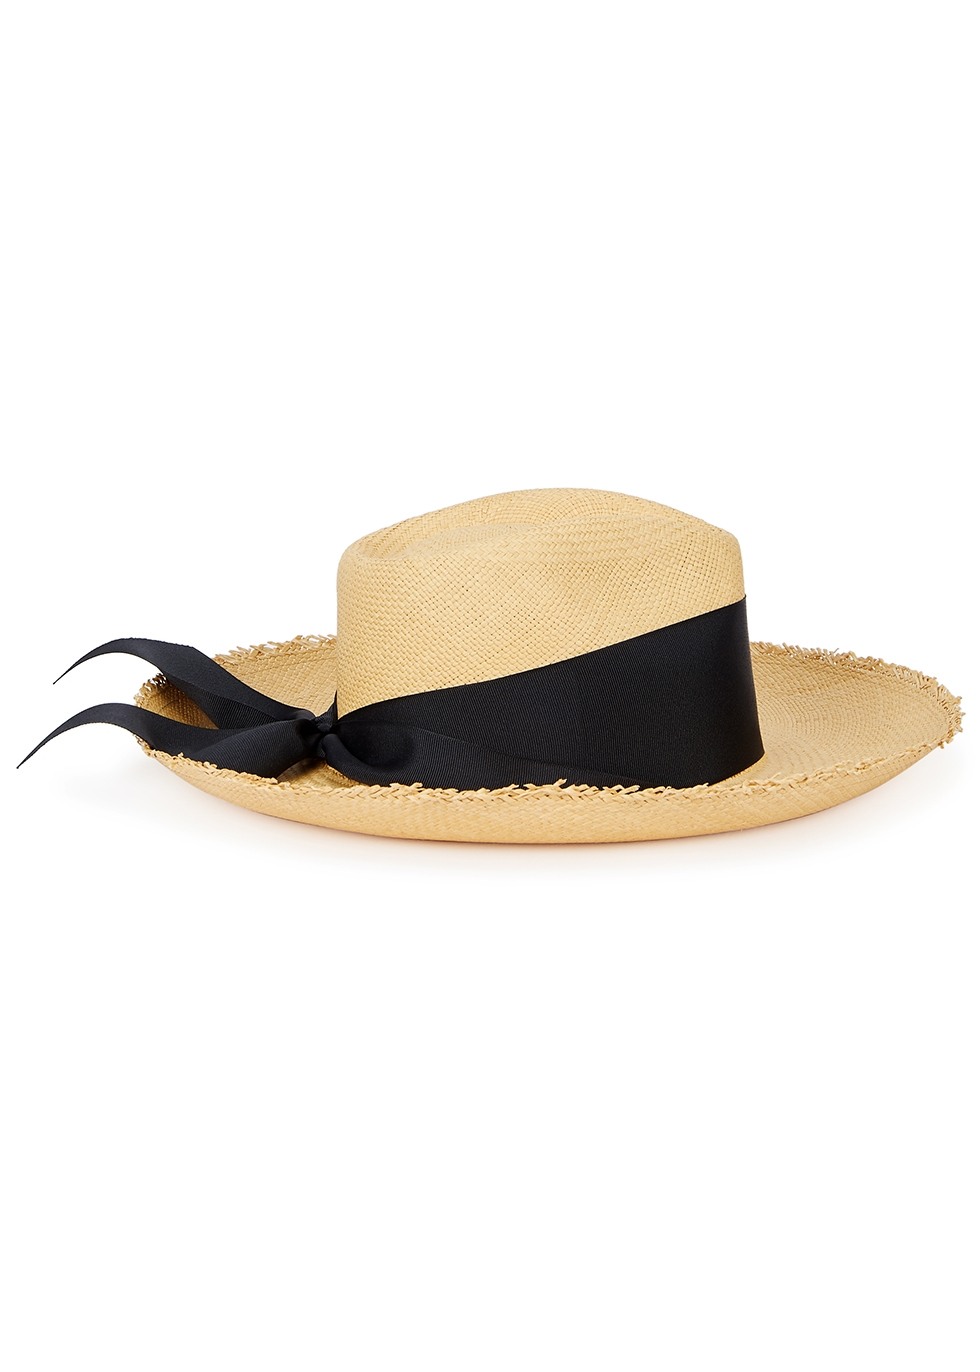 54cb70bbfac65f Women's Designer Hats, Beanies and Caps - Harvey Nichols